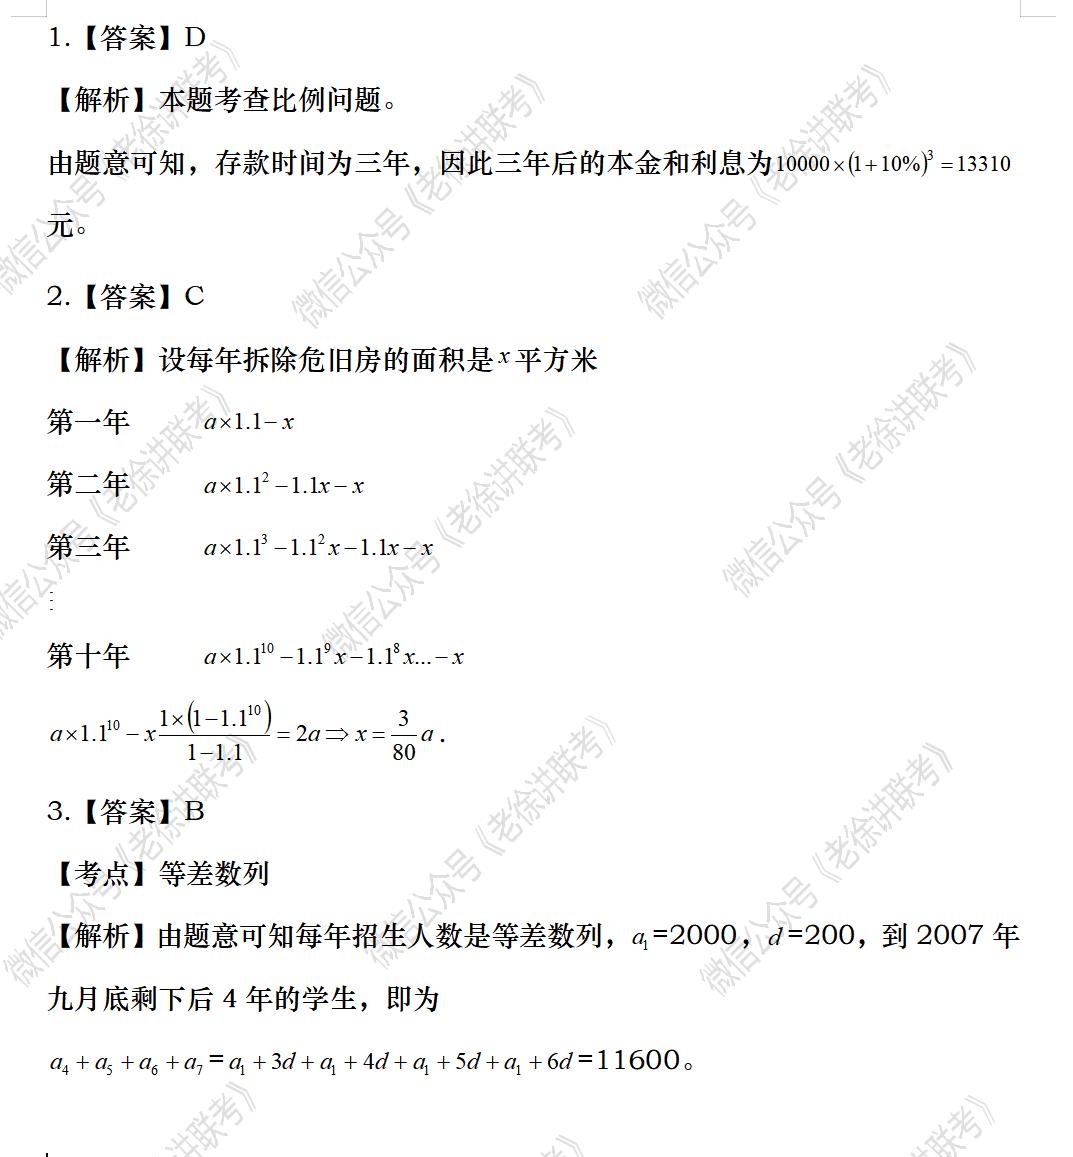 2022MBA考研|管理类联考:数学专题训练--数列的应用题(第一期)